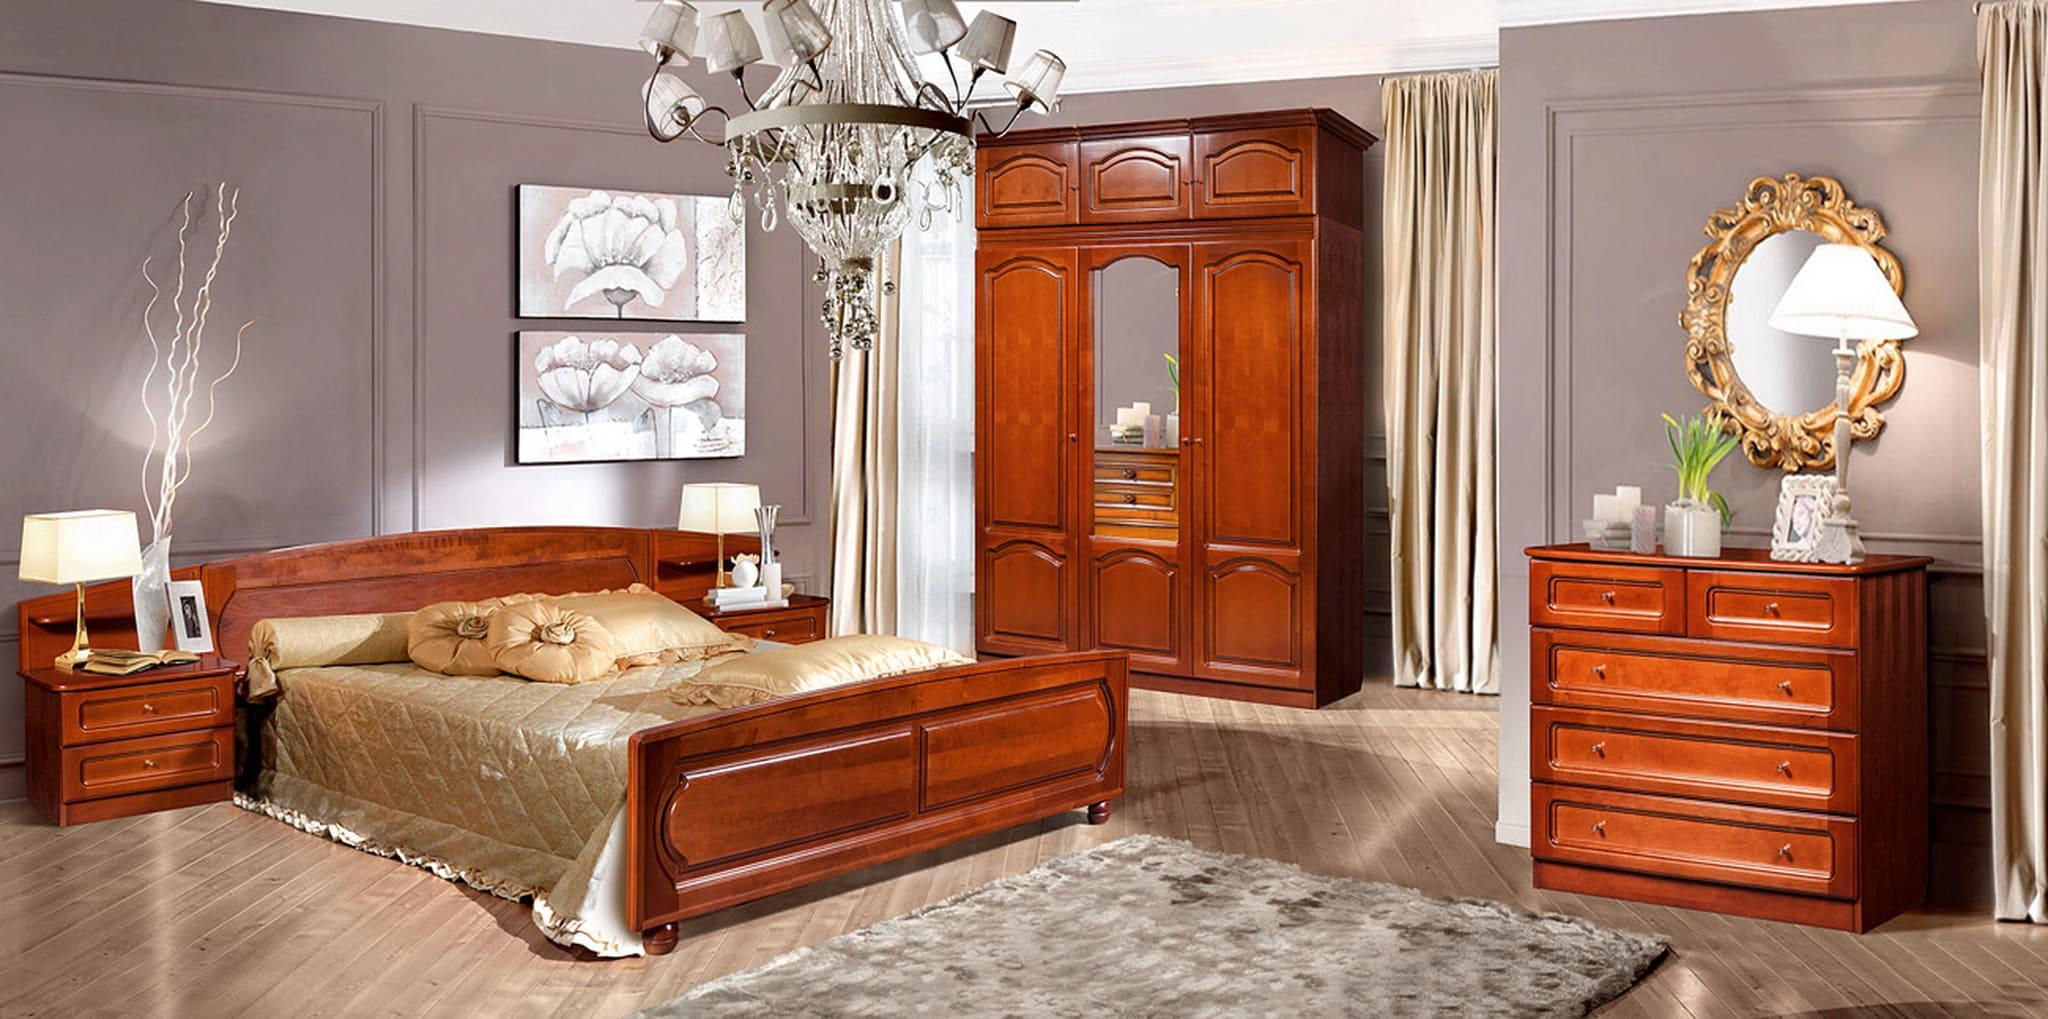 Набор мебели для спальни «Купава-3» ГМ 8420-02 (дуб)